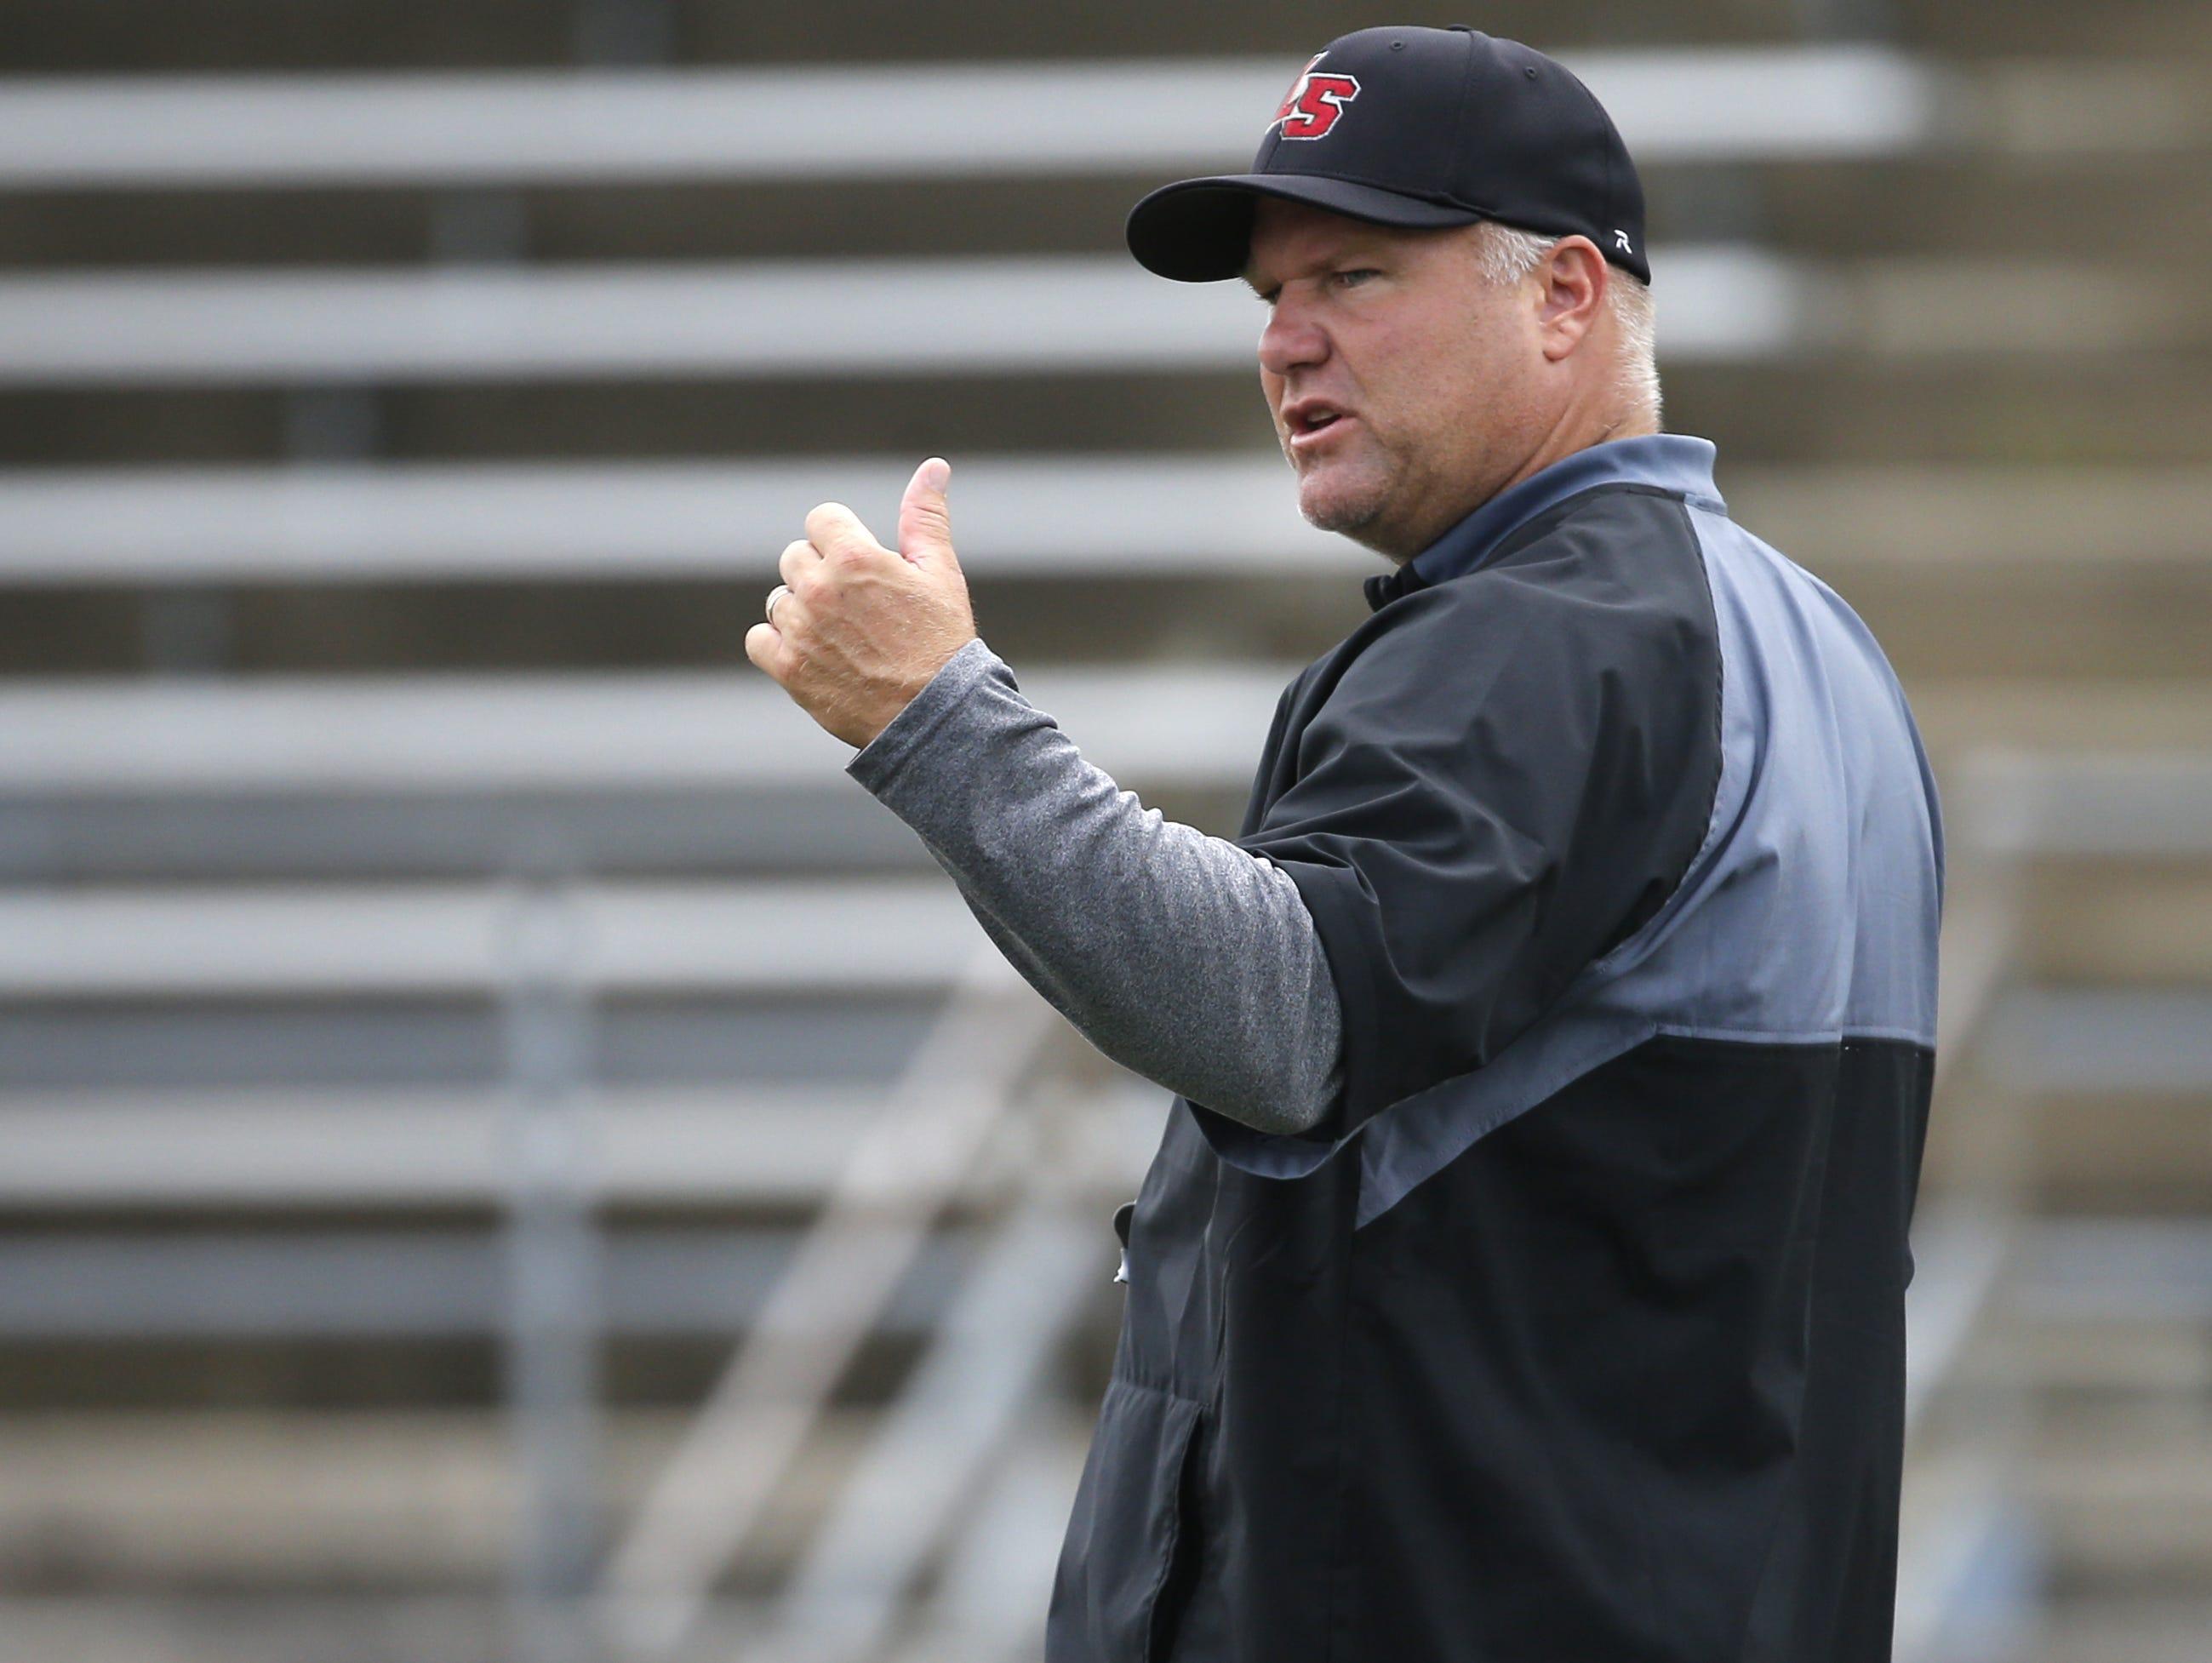 La Salle head football coach Jim Hilvert